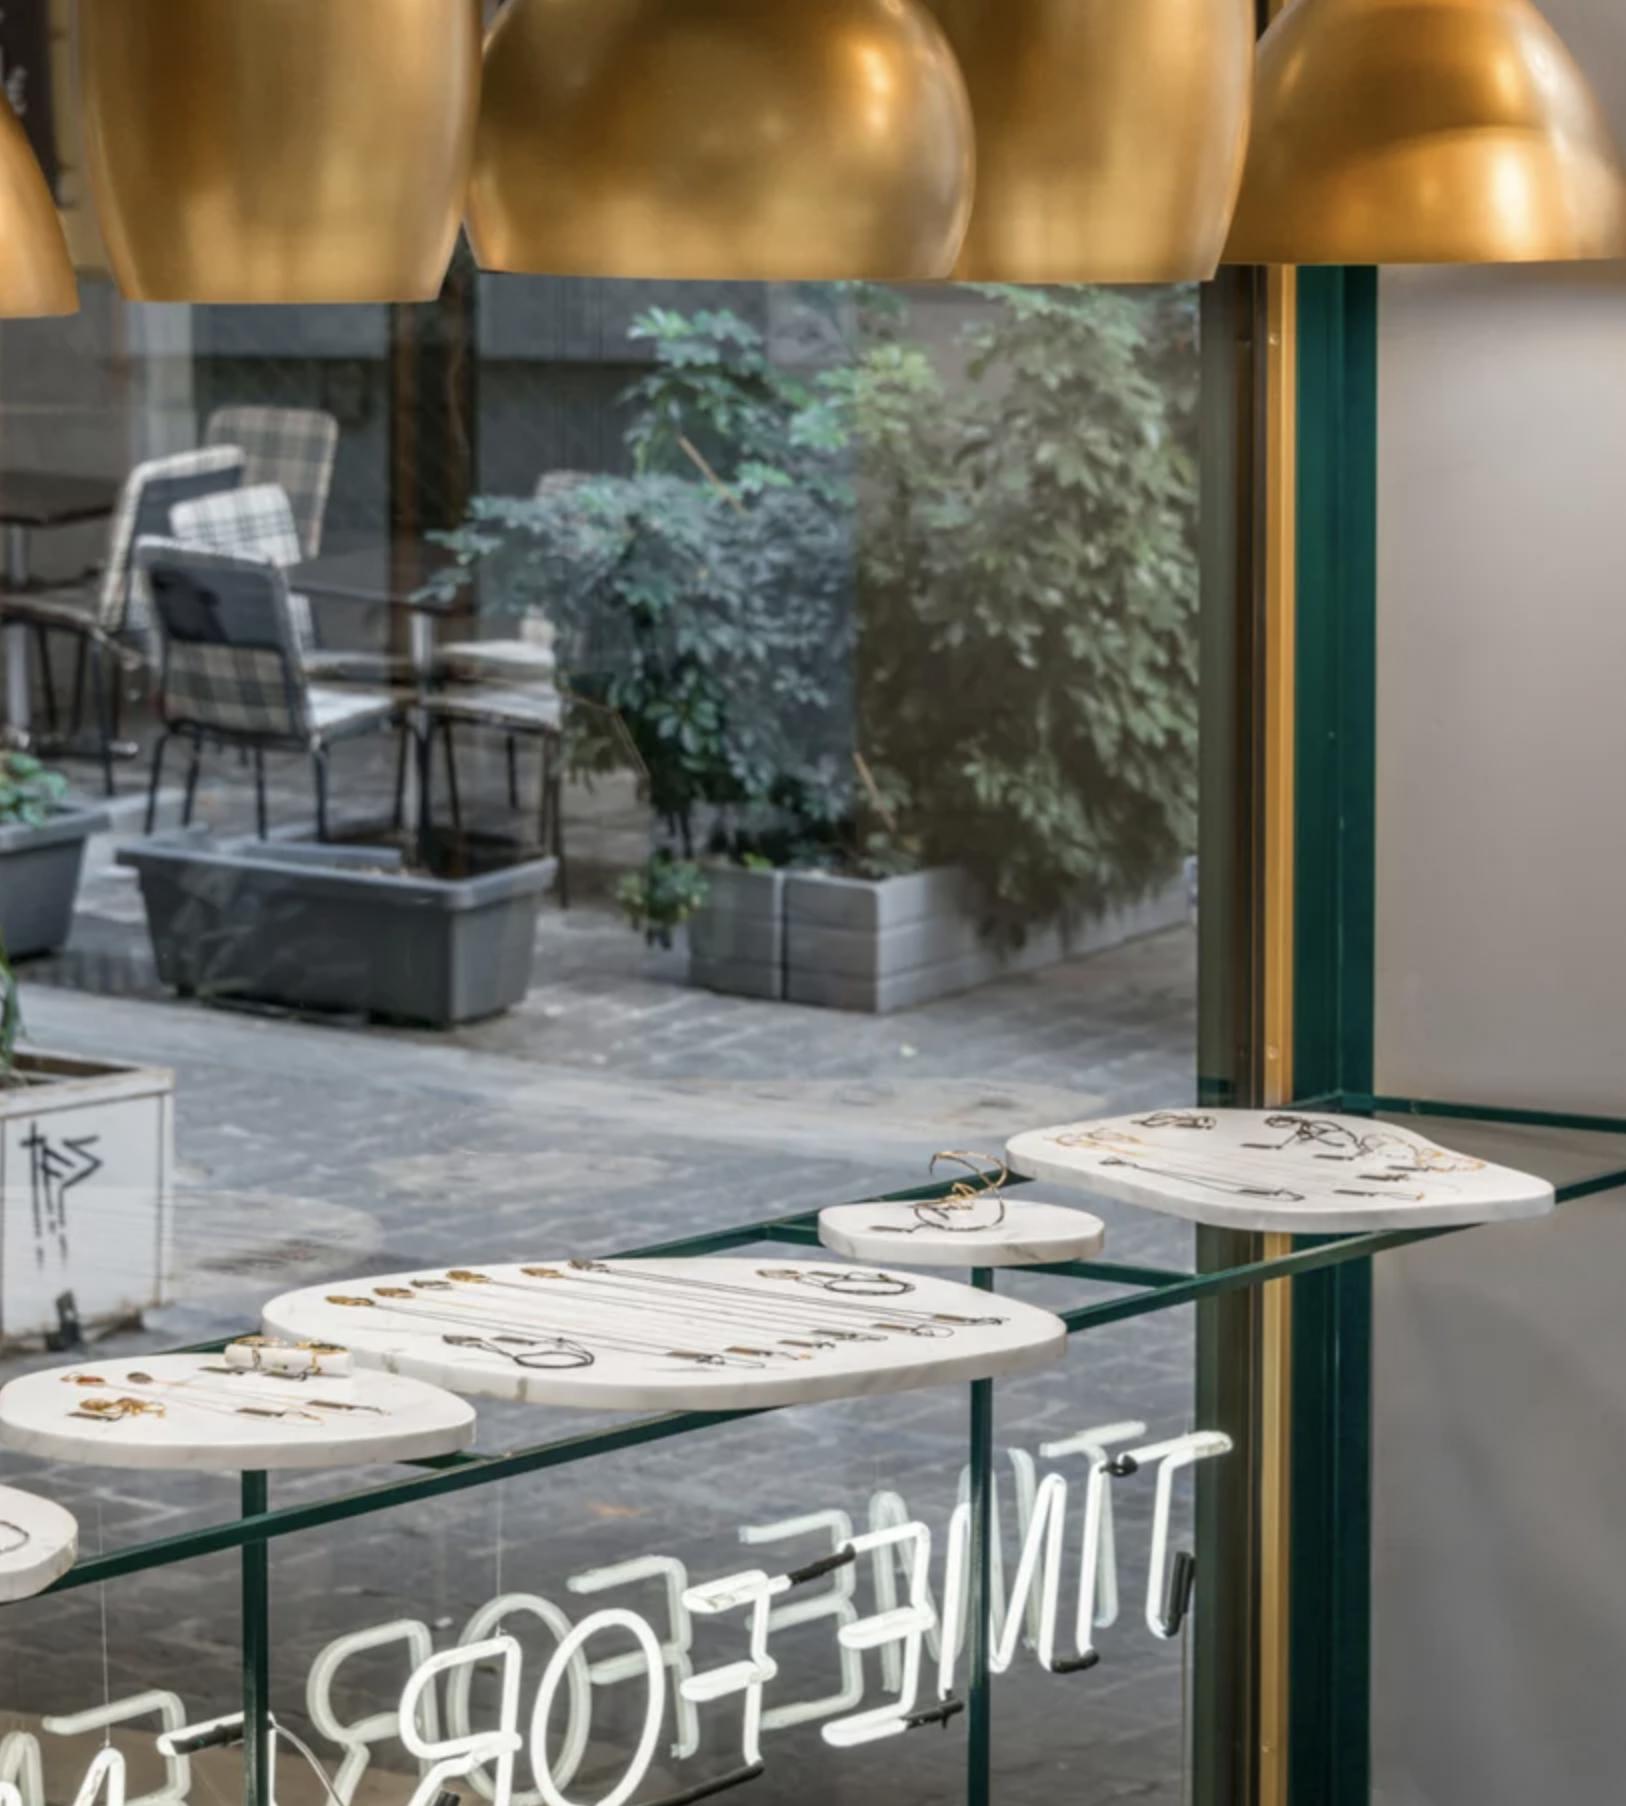 viventium-design-zac-kraemer-urban-soul-jewelry-retail-design-6.png